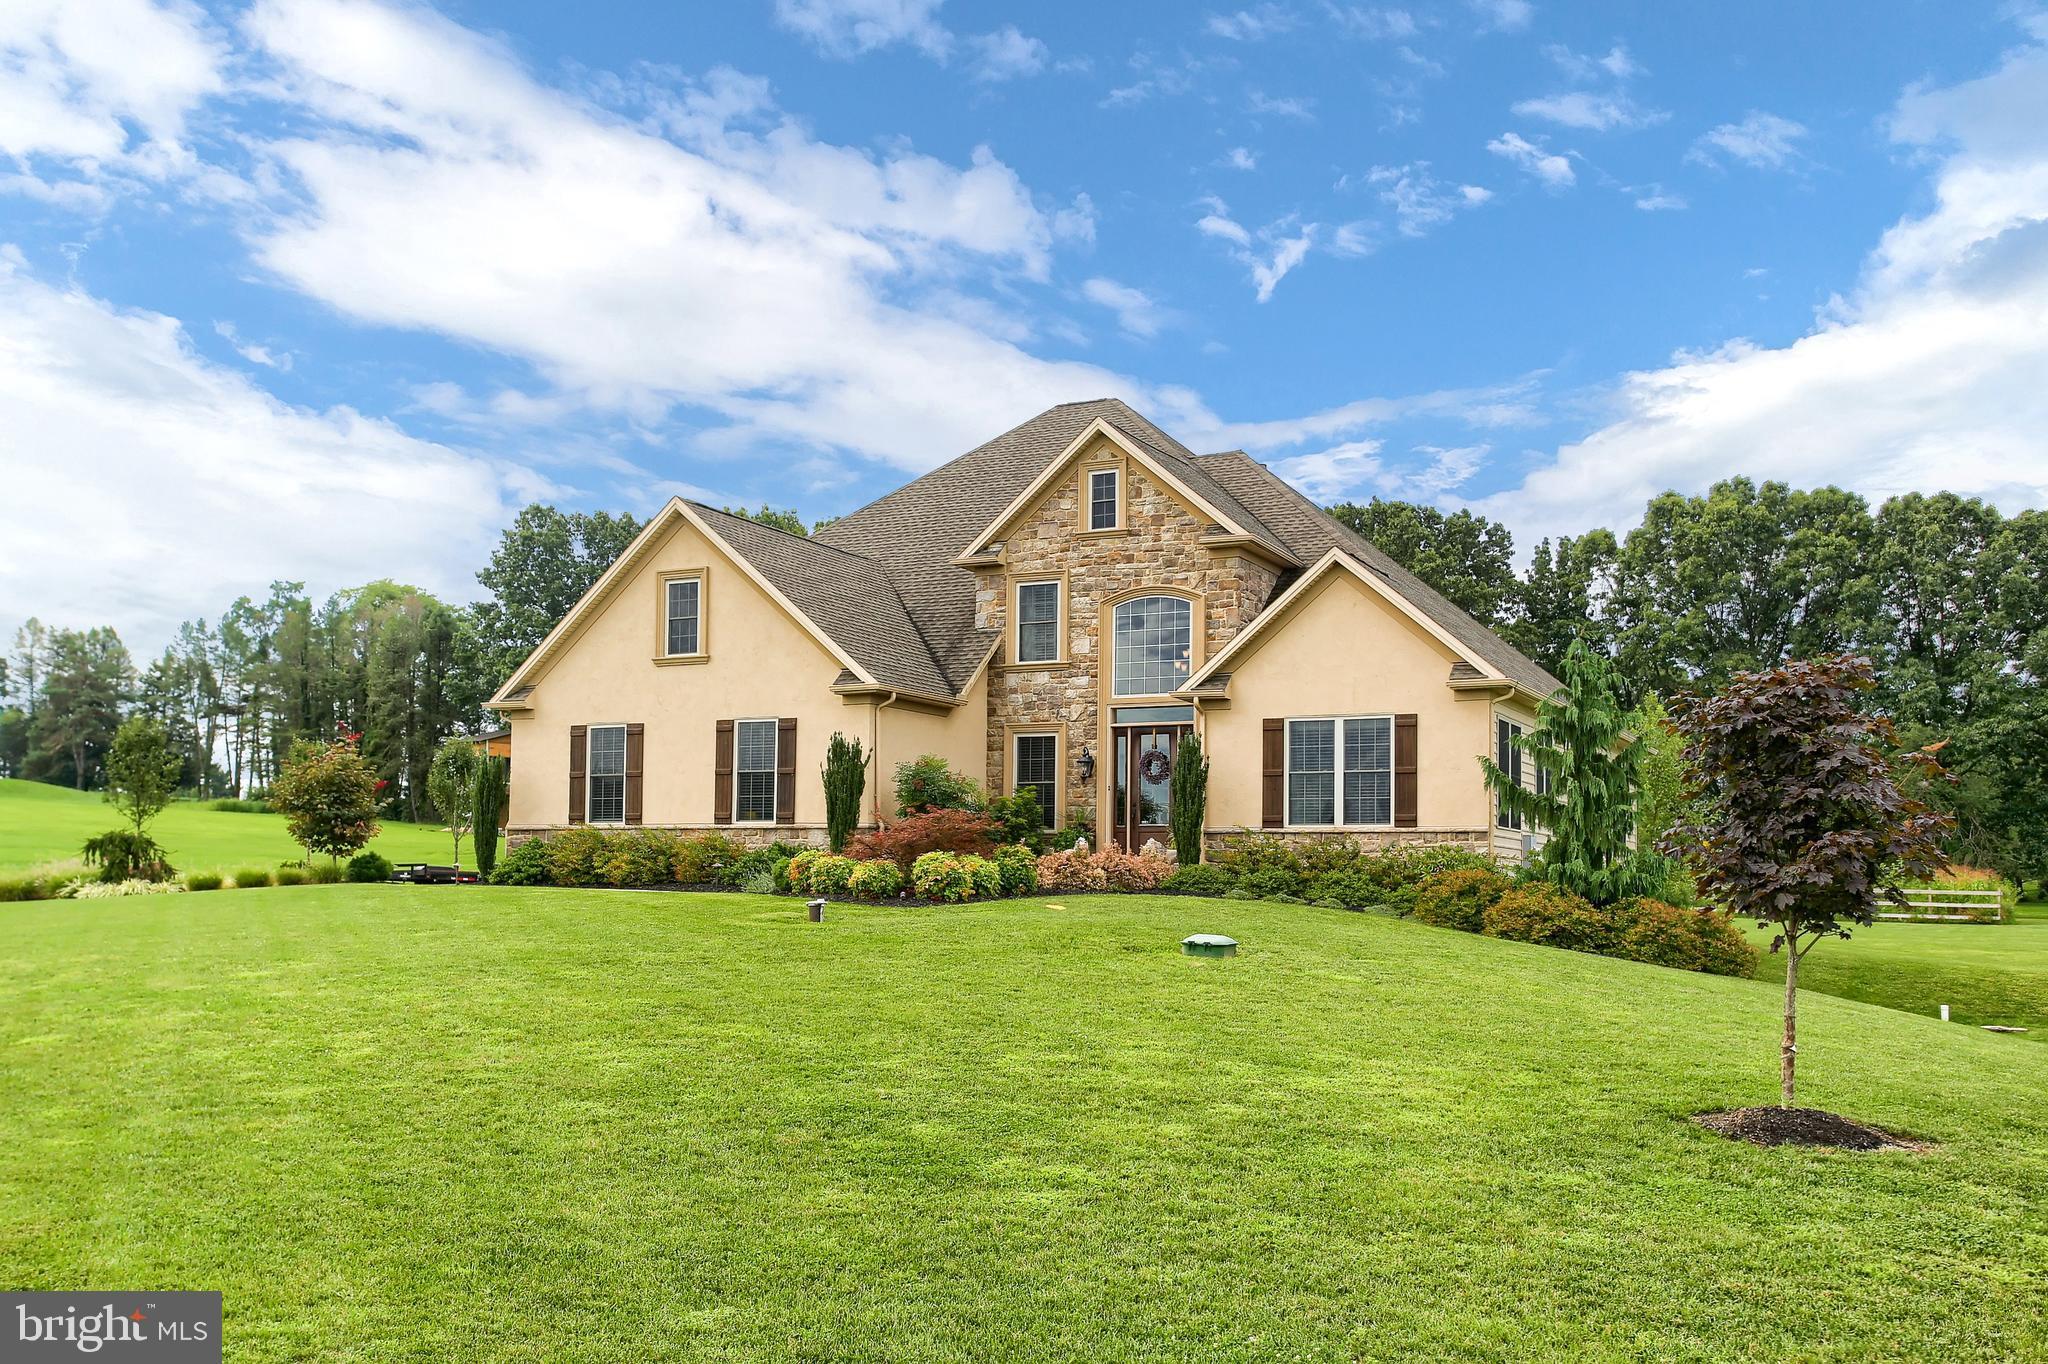 650 Fox Hollow Court, Spring Grove, PA 17362